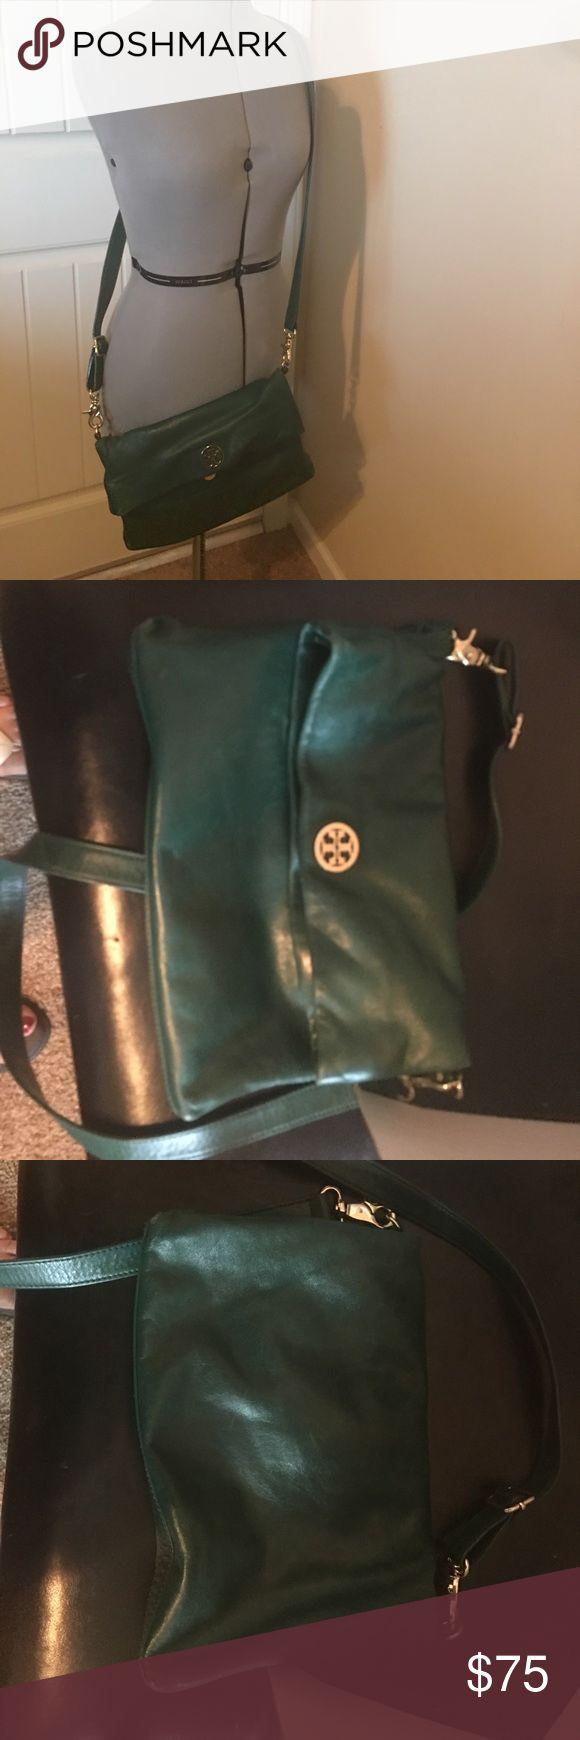 Tory Burch green crossover bag Tory Burch green crossover bag Tory Burch Bags Crossbody Bags